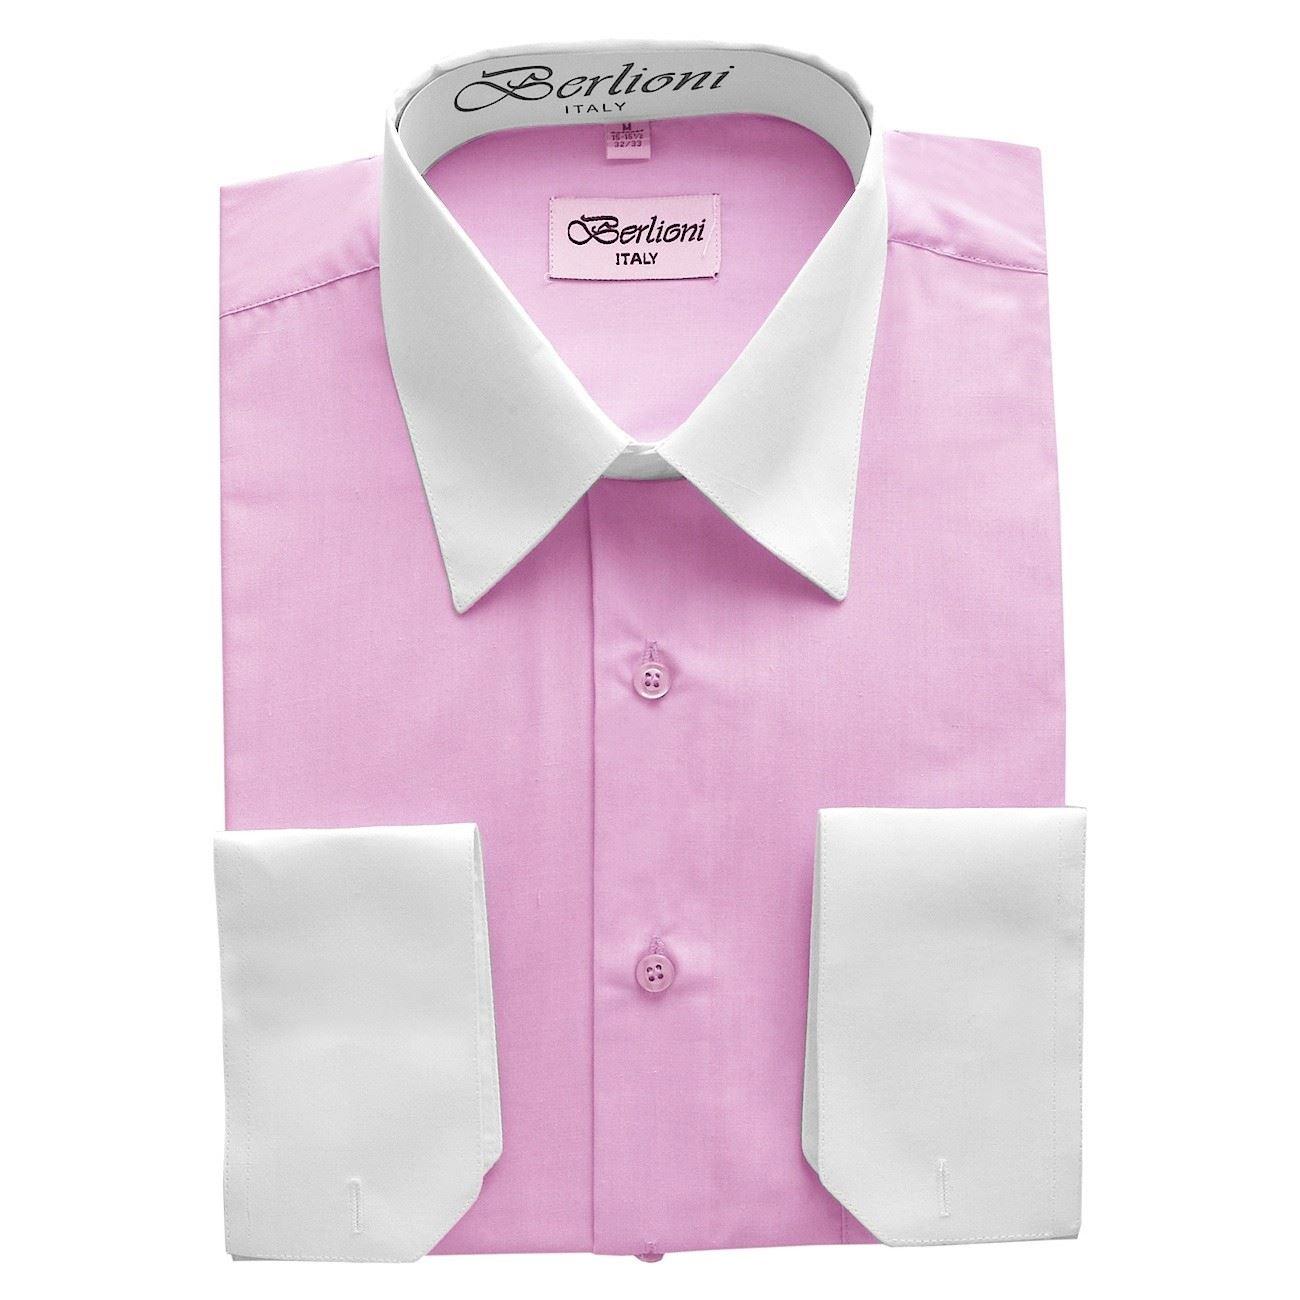 Berlioni mens italy dress shirt two tone long sleeve shirt for Mens dress shirts sizes